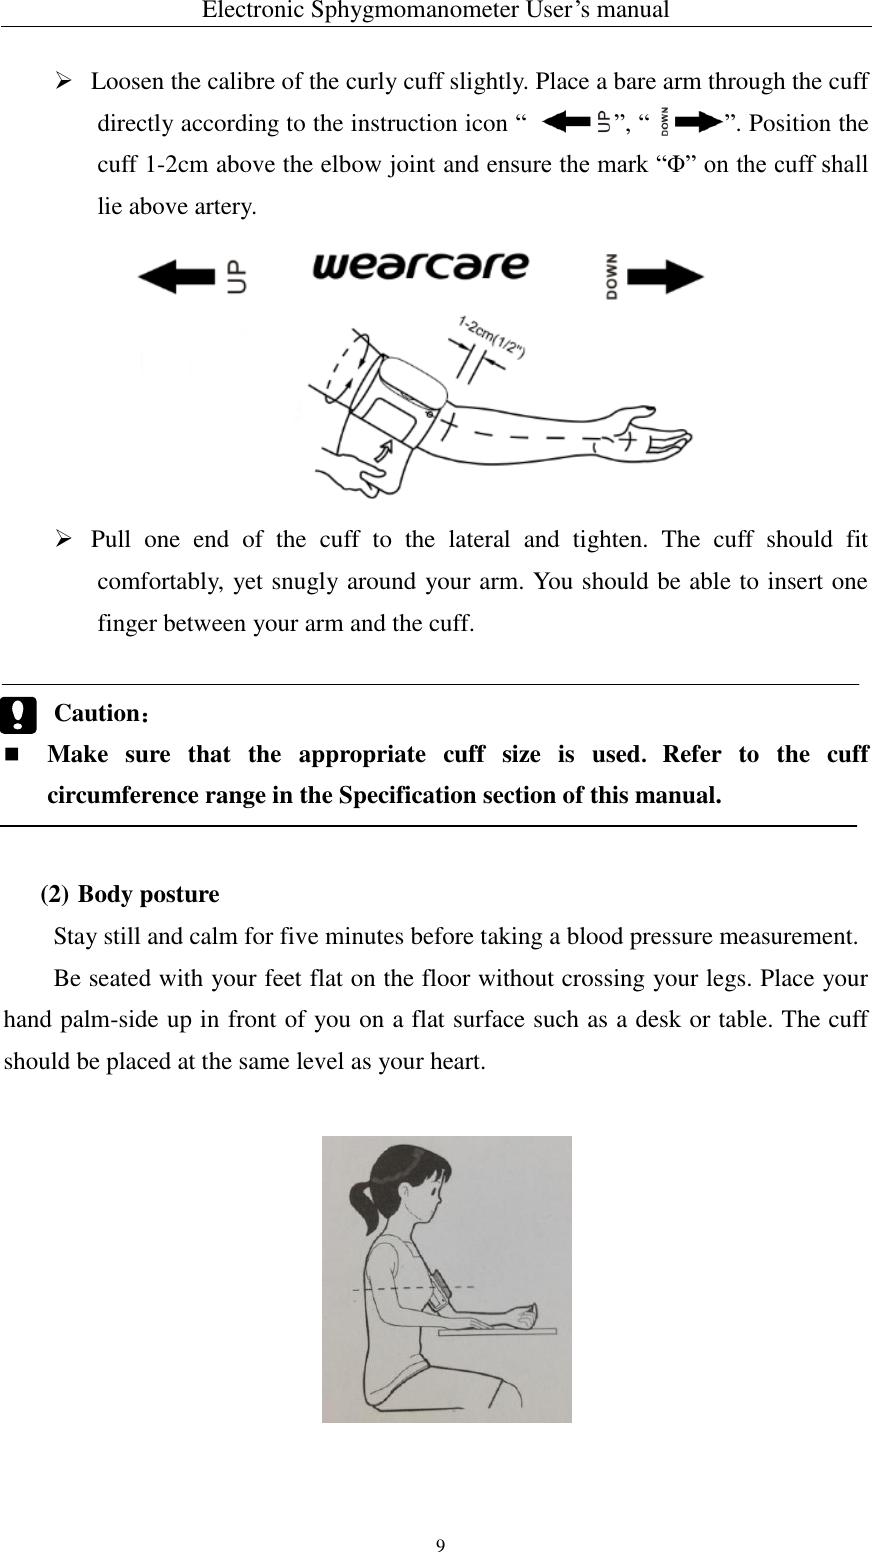 Nursing Skills Guide Sphygmomanometer Manual Guide